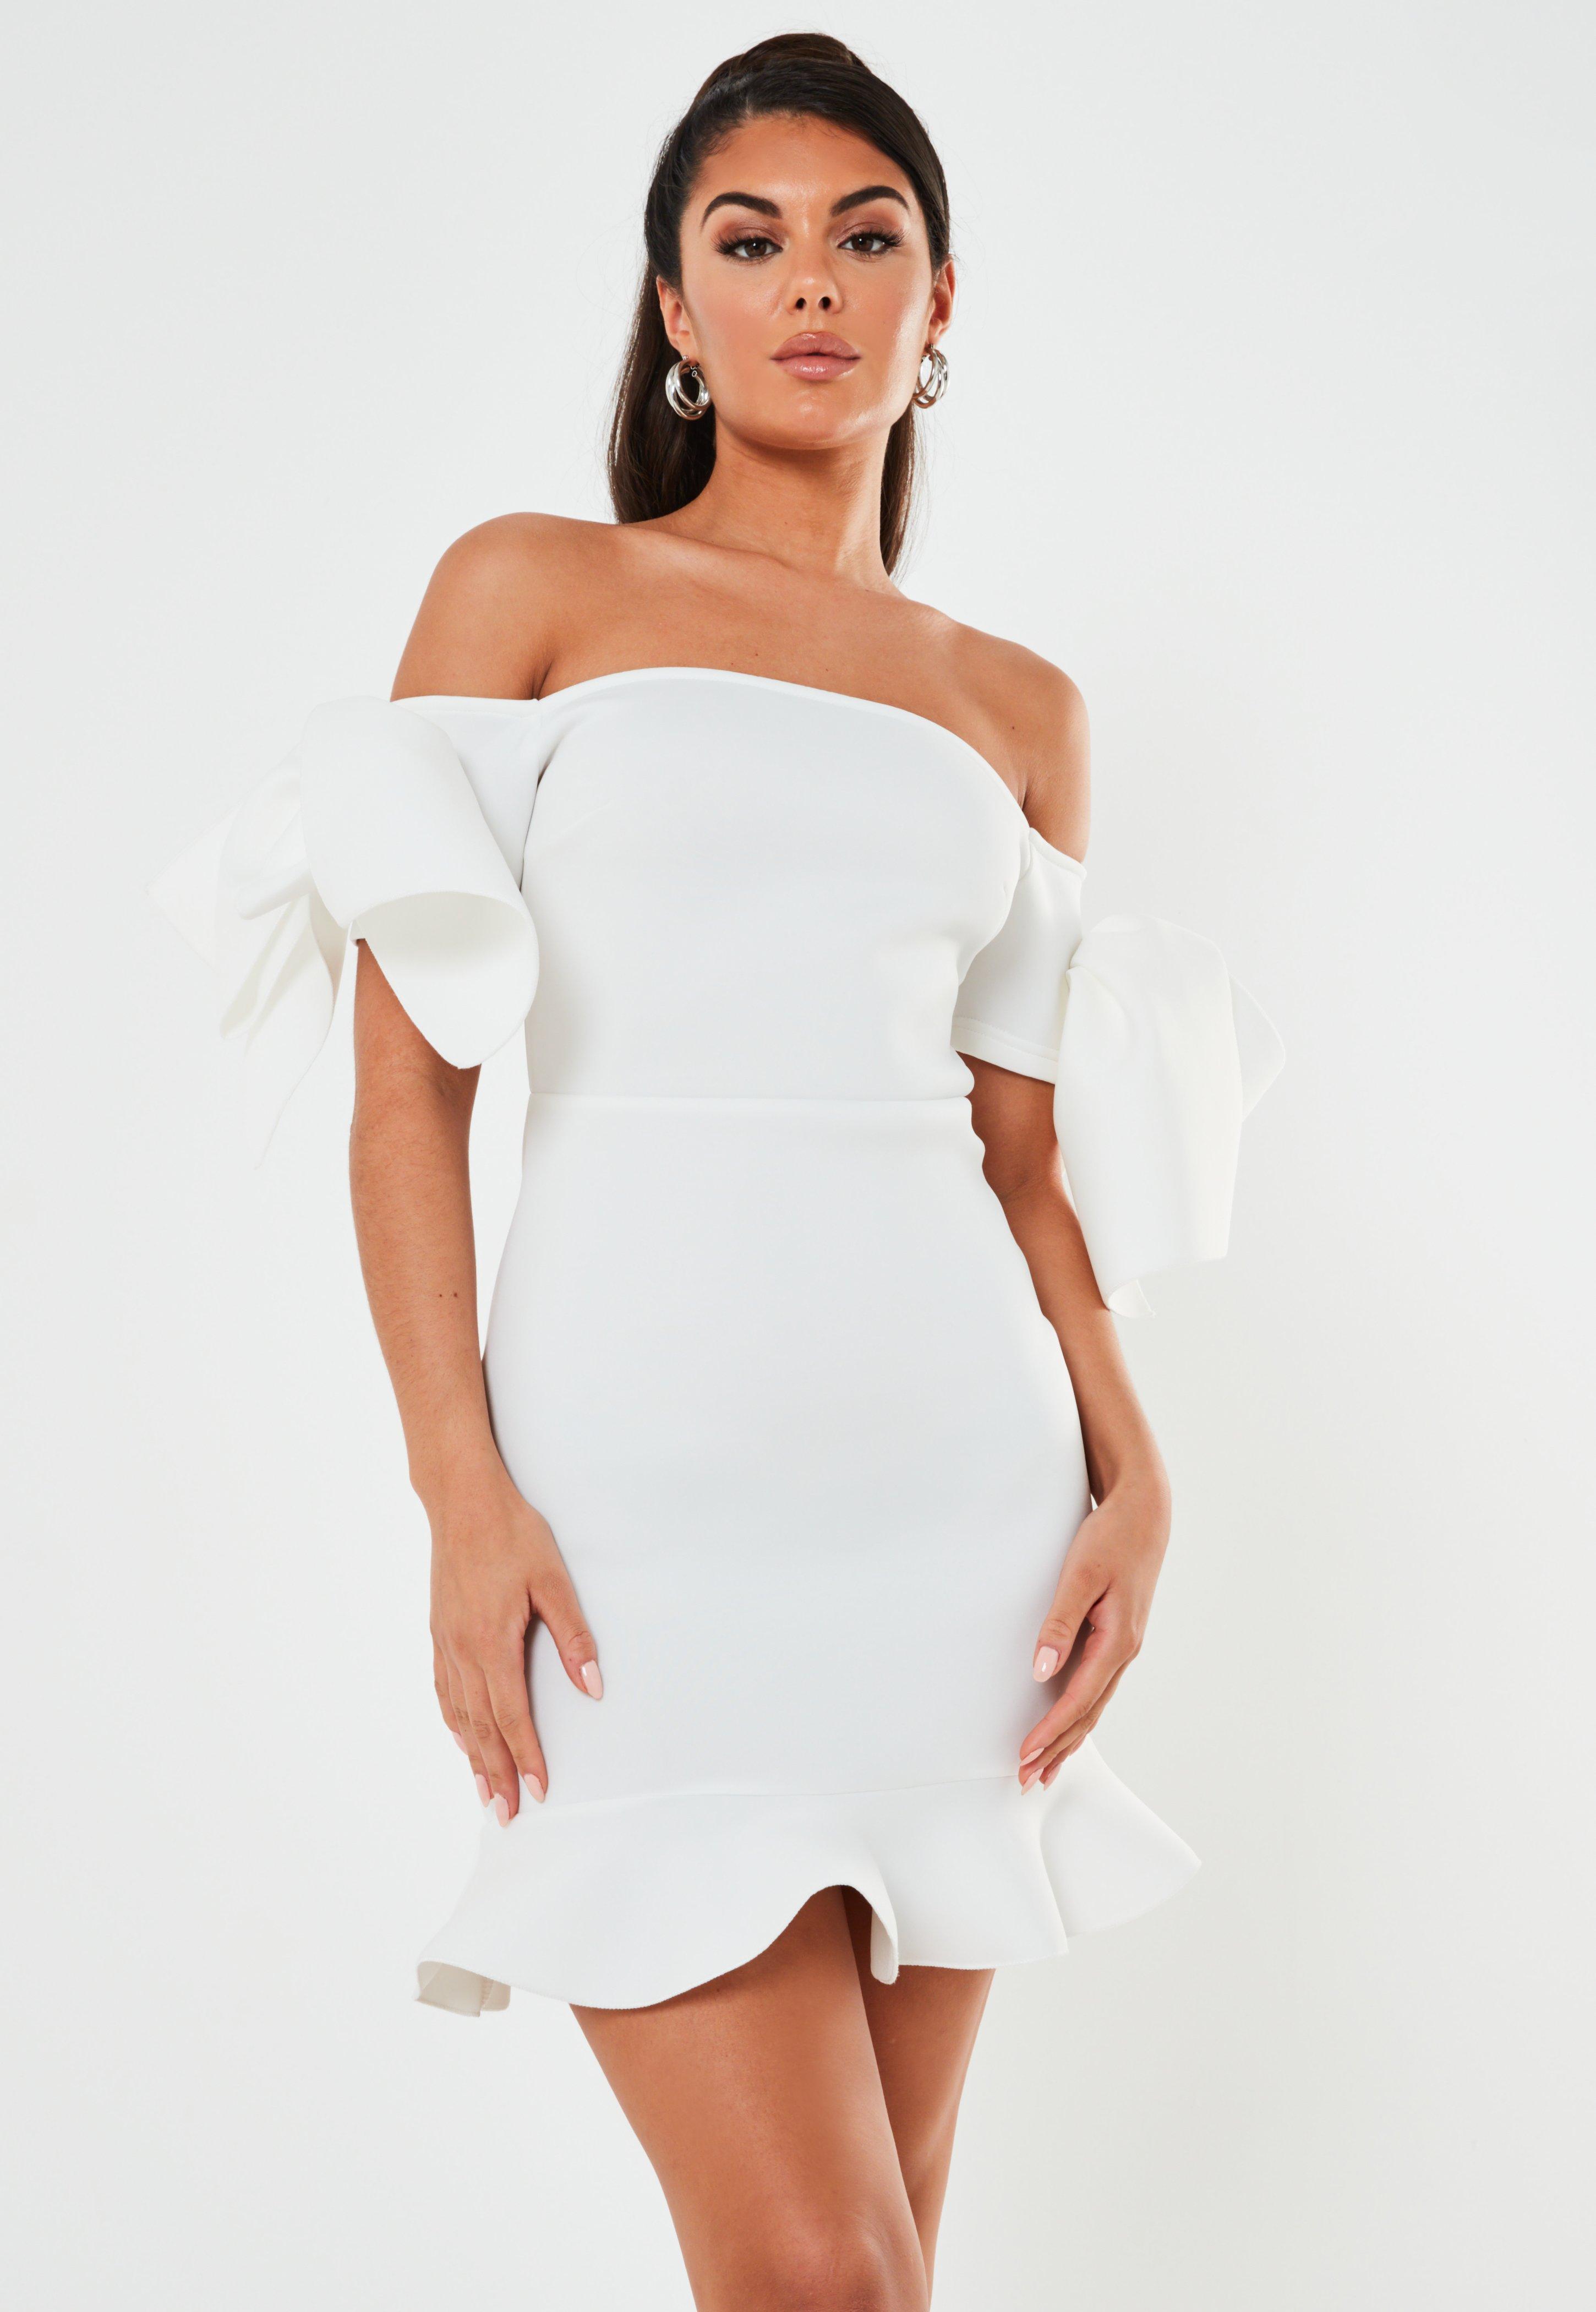 UK Women Striped Off Shoulder Frill Ruffle Belted Bardot Beach Dress Size 6-14